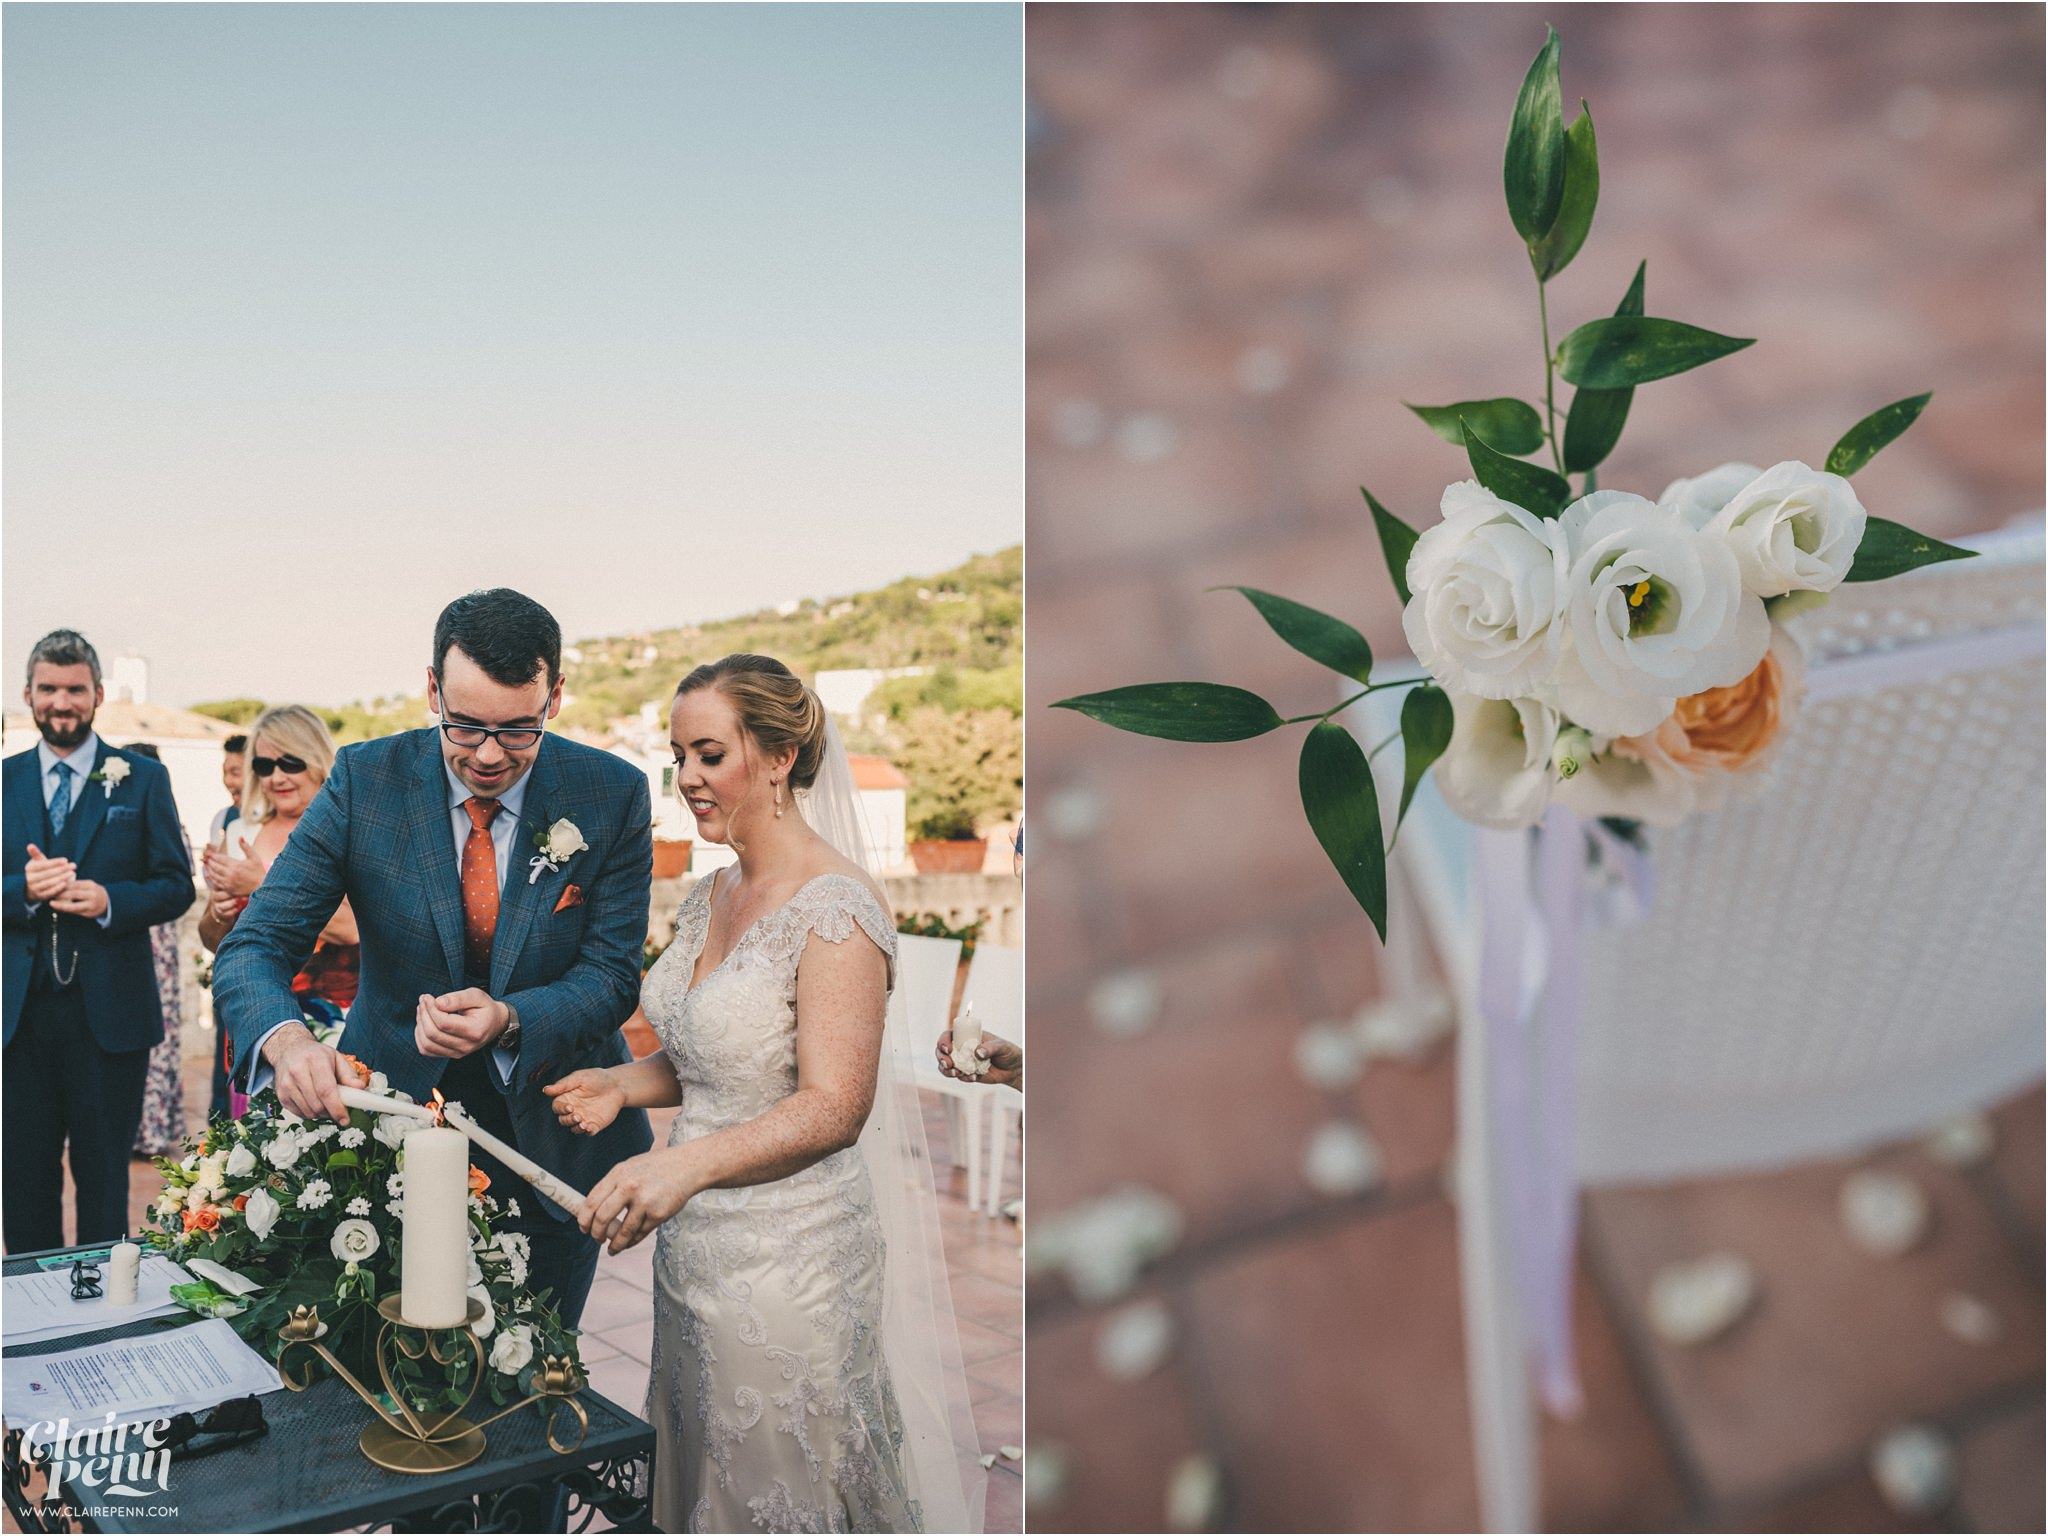 Hilltop destination wedding Santa Maria di Castellabate Italy_0028.jpg